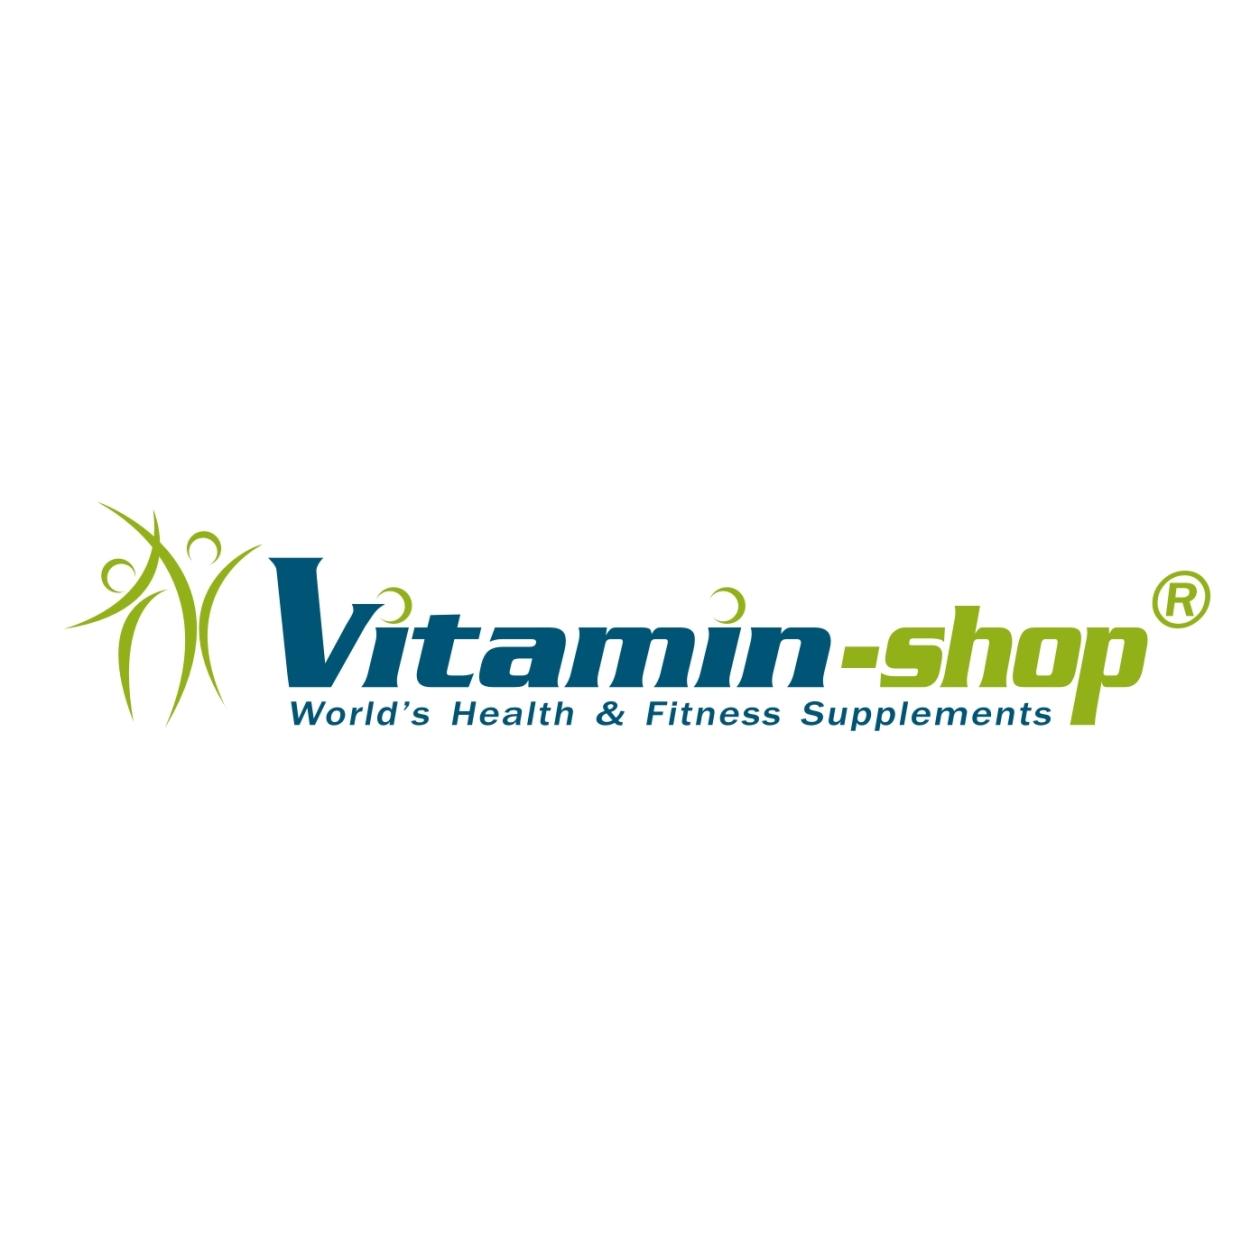 Vitamin Shop Ltd Franchise